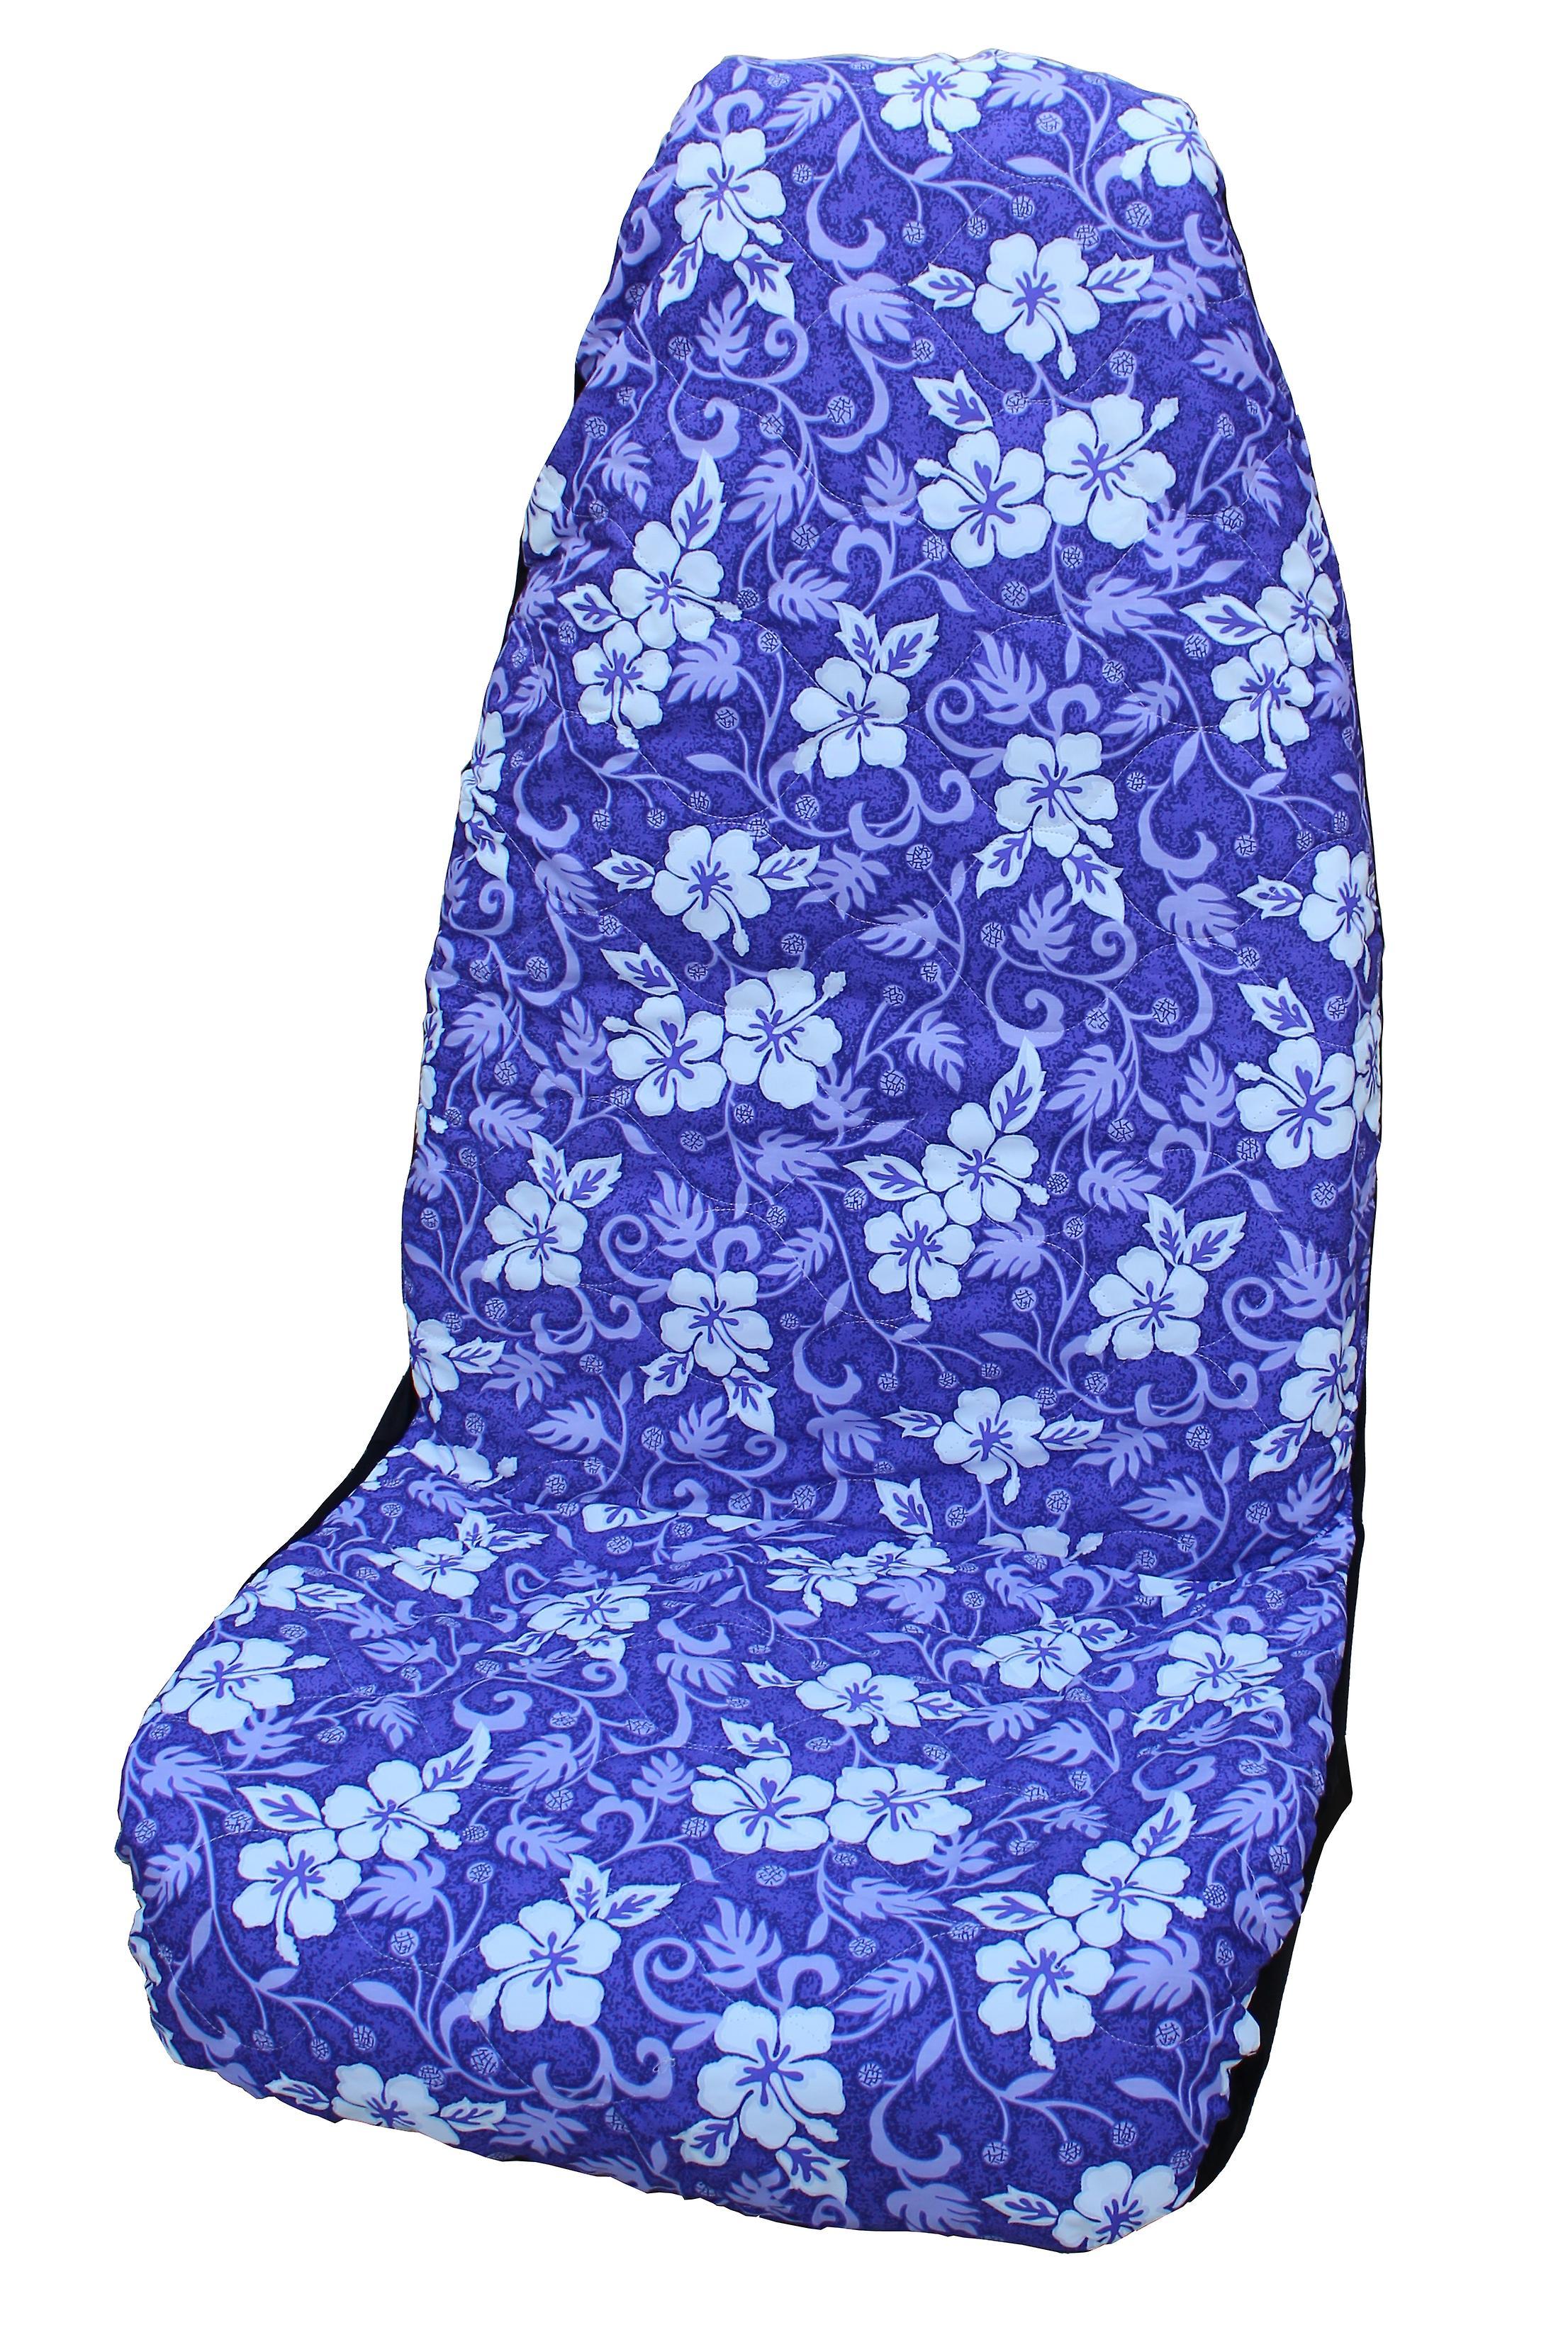 Side Airbag Optional; Ulu Fruit Hawaiian Car Seat Covers